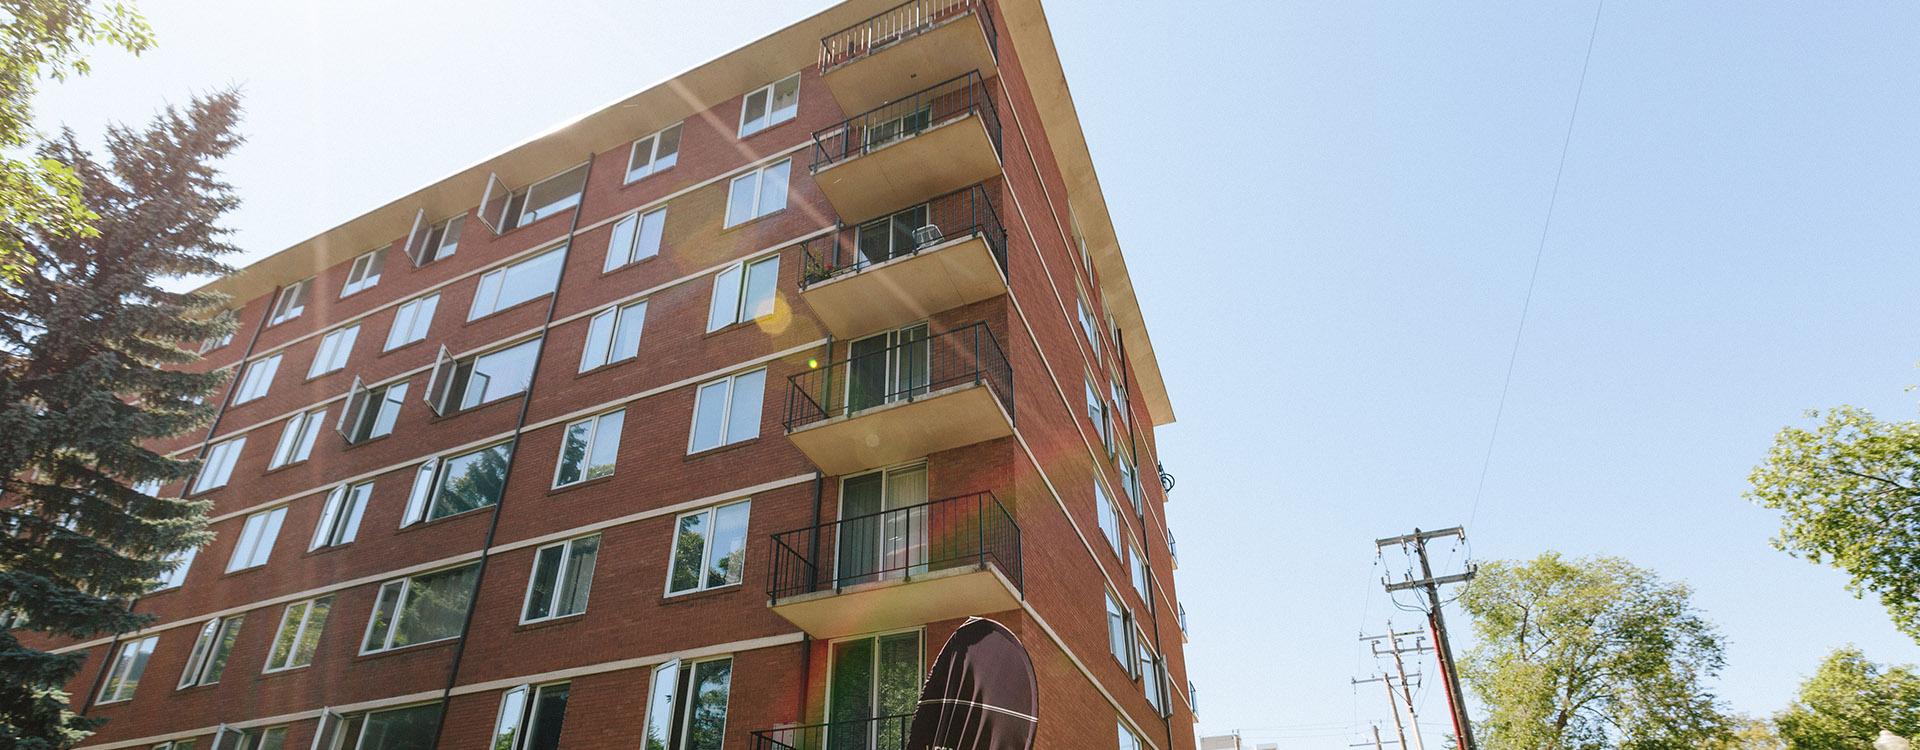 hi-level-place-11005-98-avenue-nw-edmonton-exterior